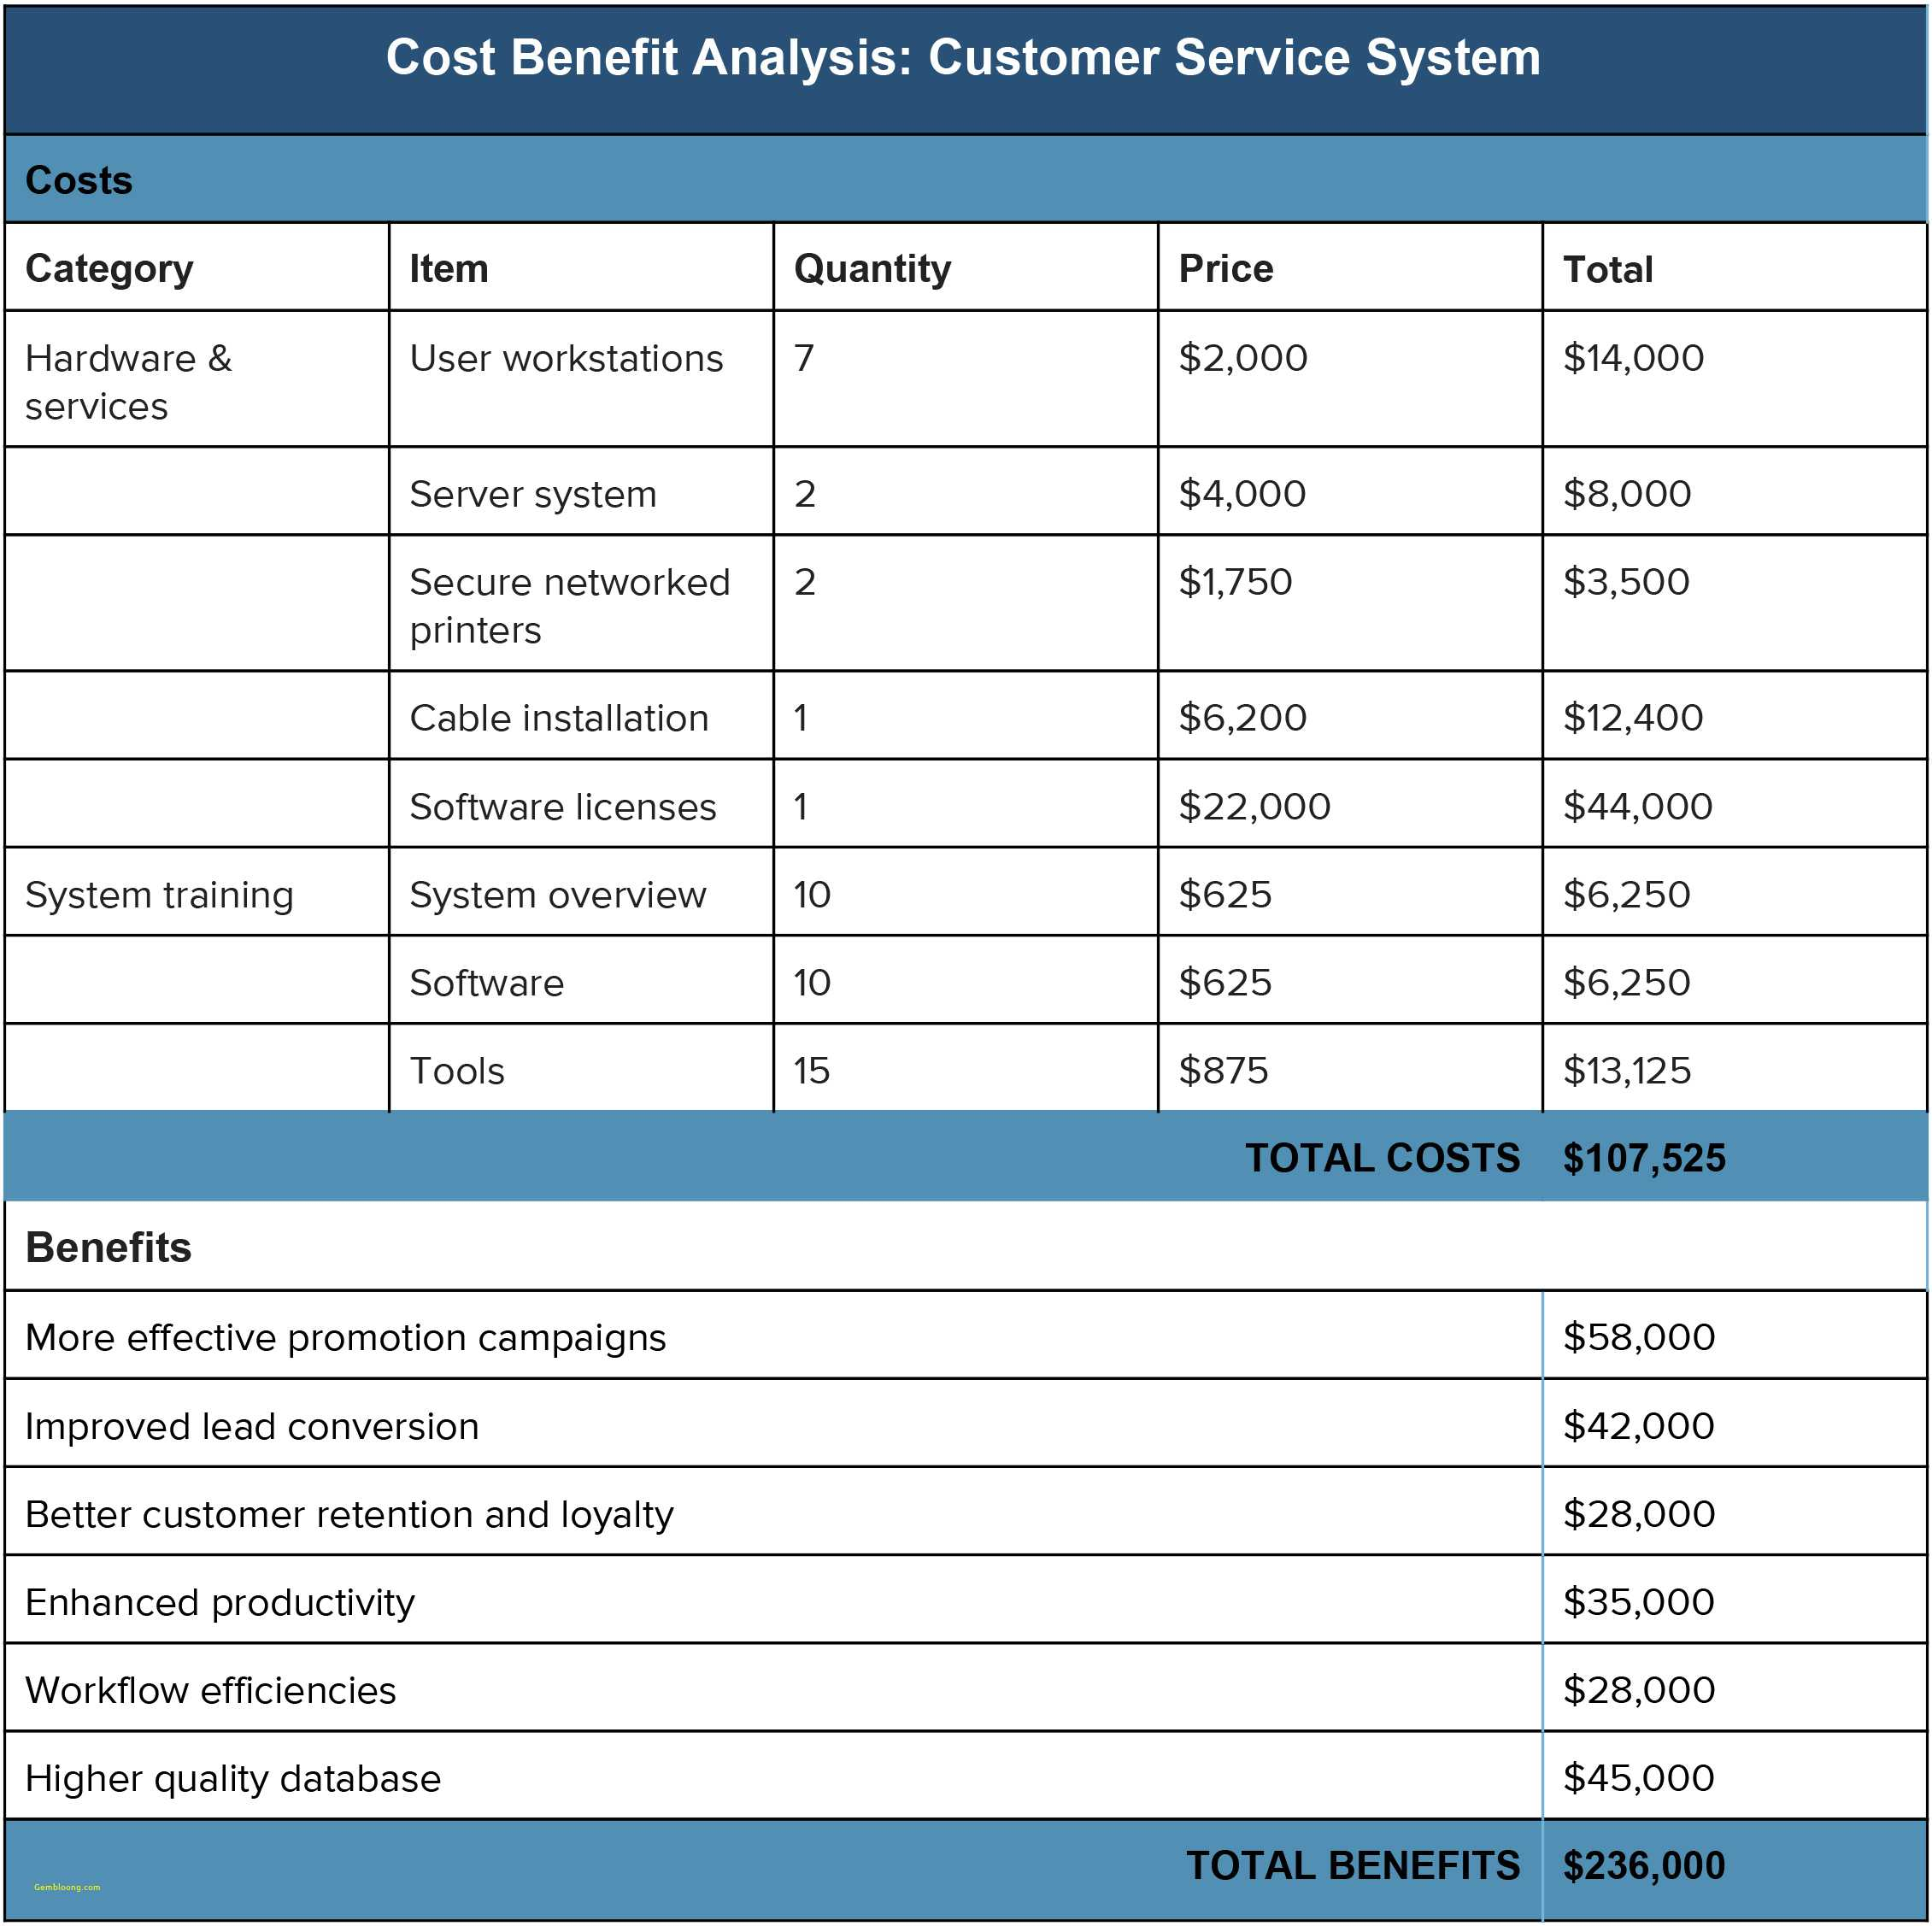 Revenue Cycle Performance Metrics Spreadsheet 03012010 Xls For Revenue Cycle Performance Metrics Spreadsheet 03012010 Xls Together